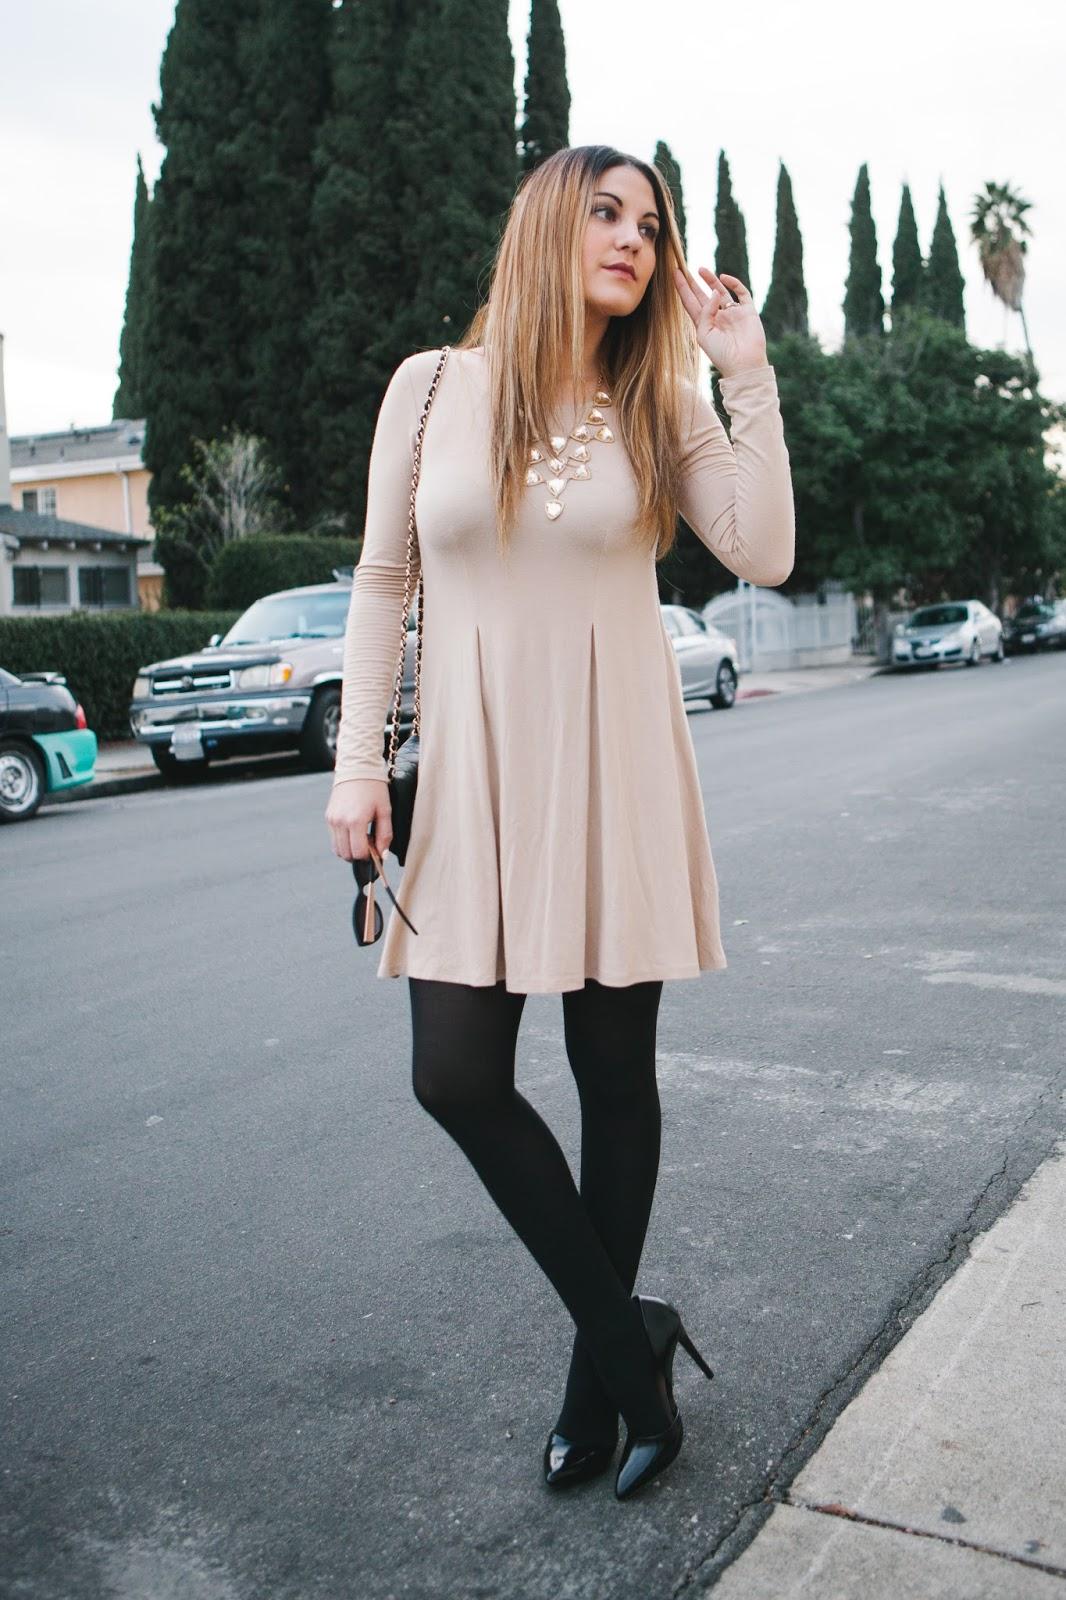 LA Fashion Blogger - My Cup of Chic